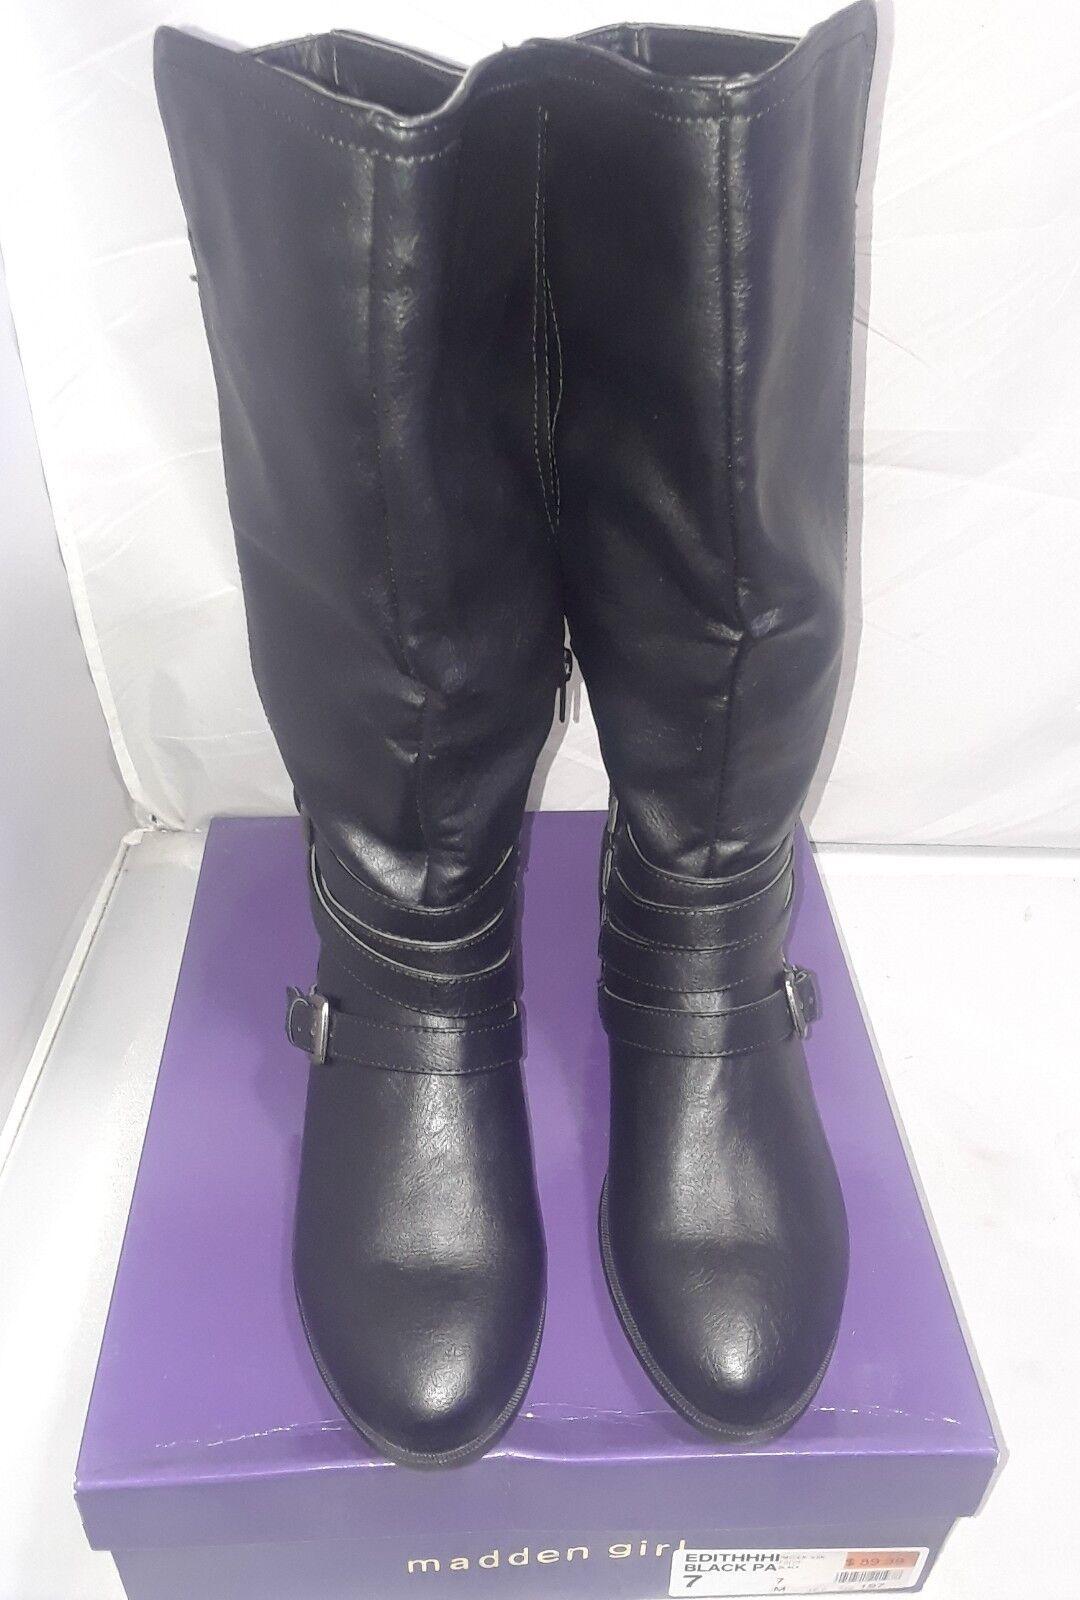 Womens Madden Girl  Edith  Black Mid-Calf Boots 7M